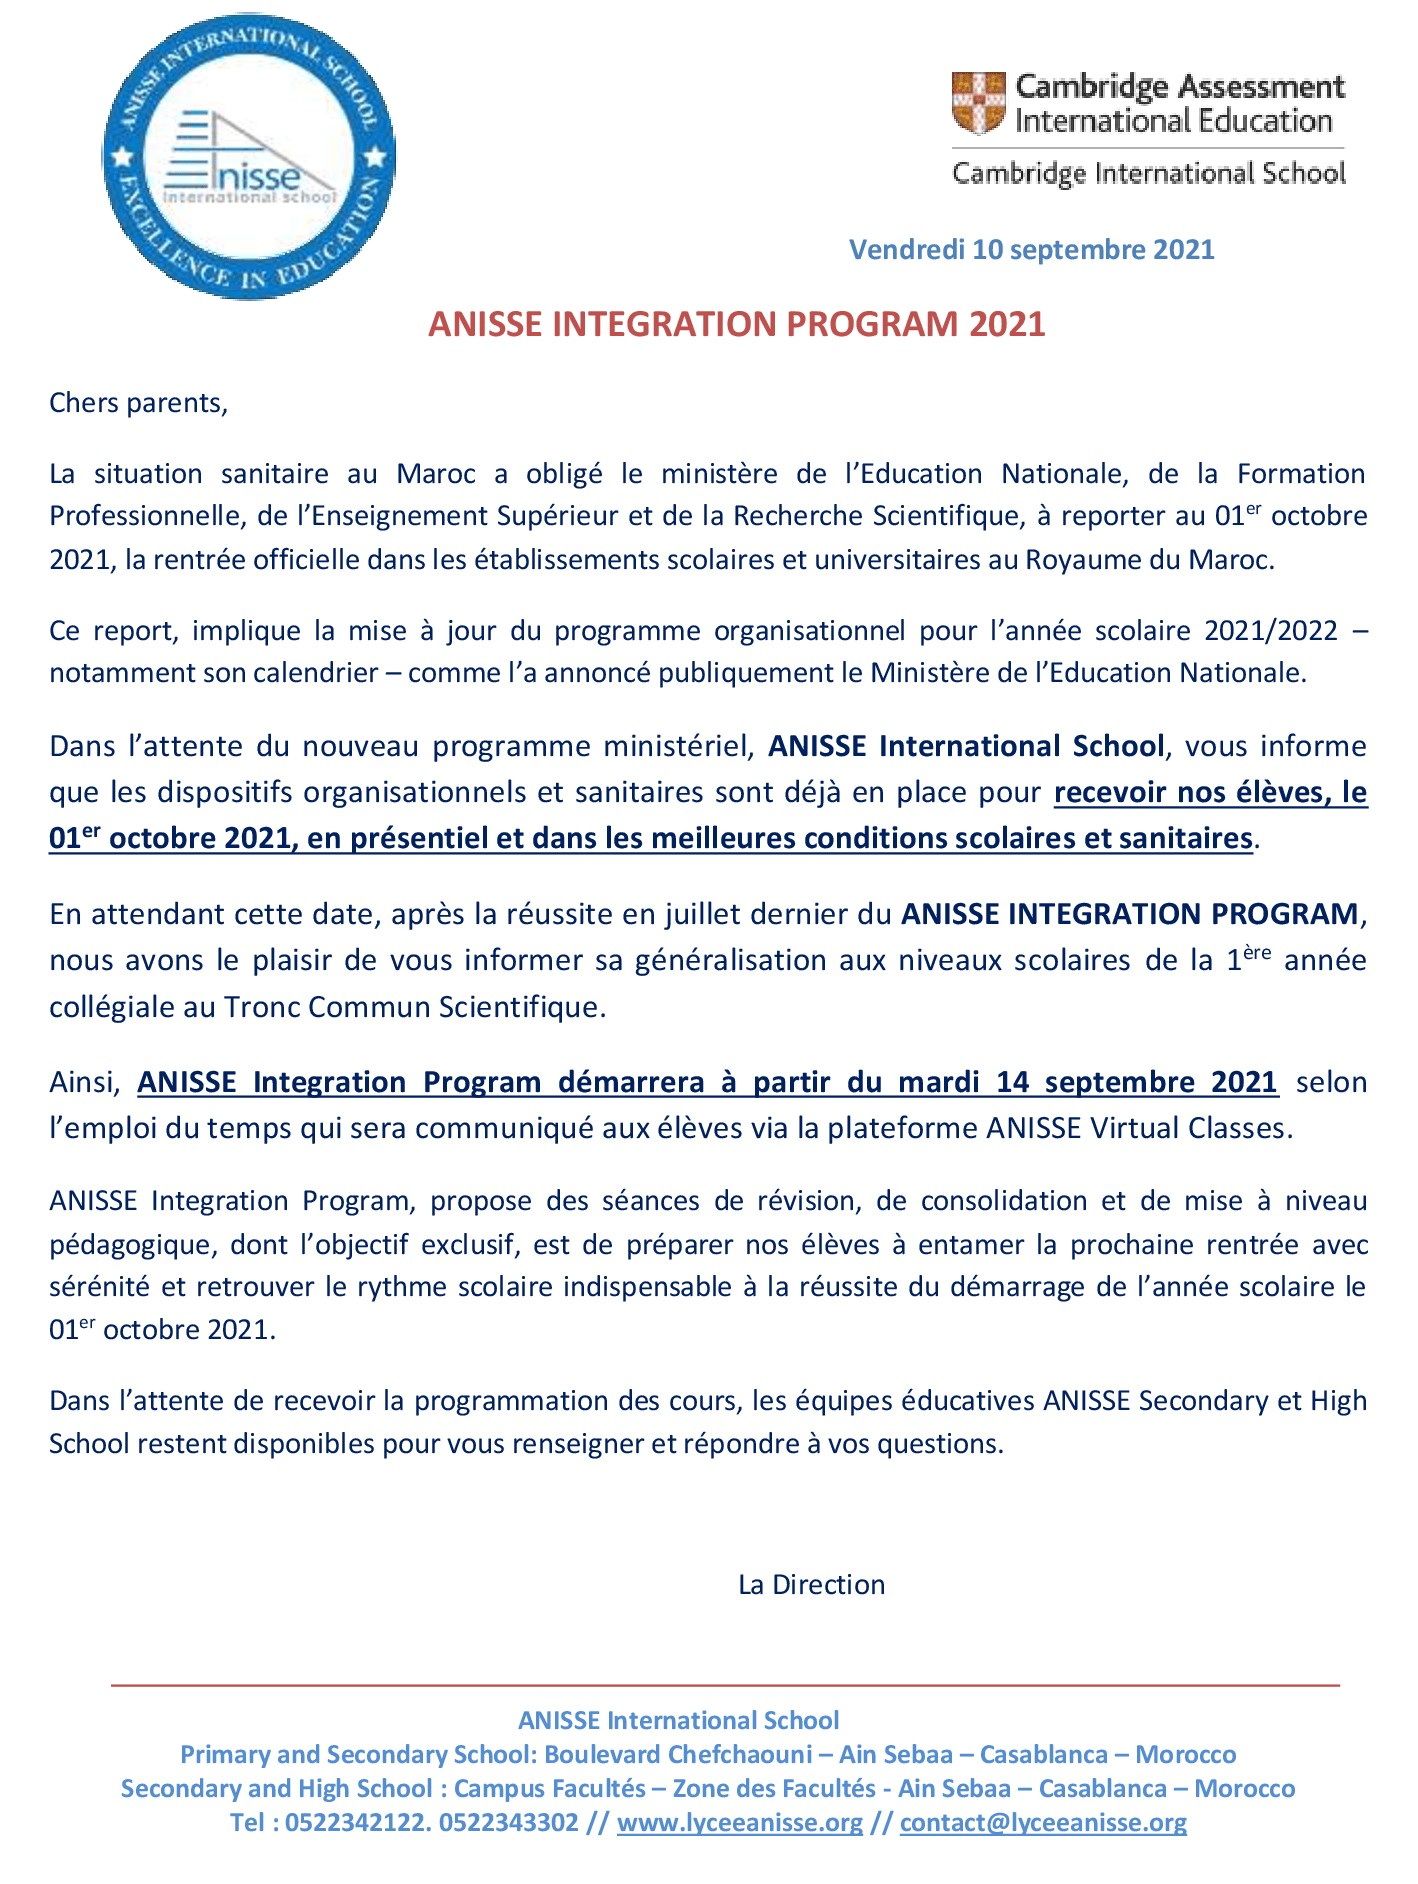 ANISSE INTEGRATION PROGRAM 2021